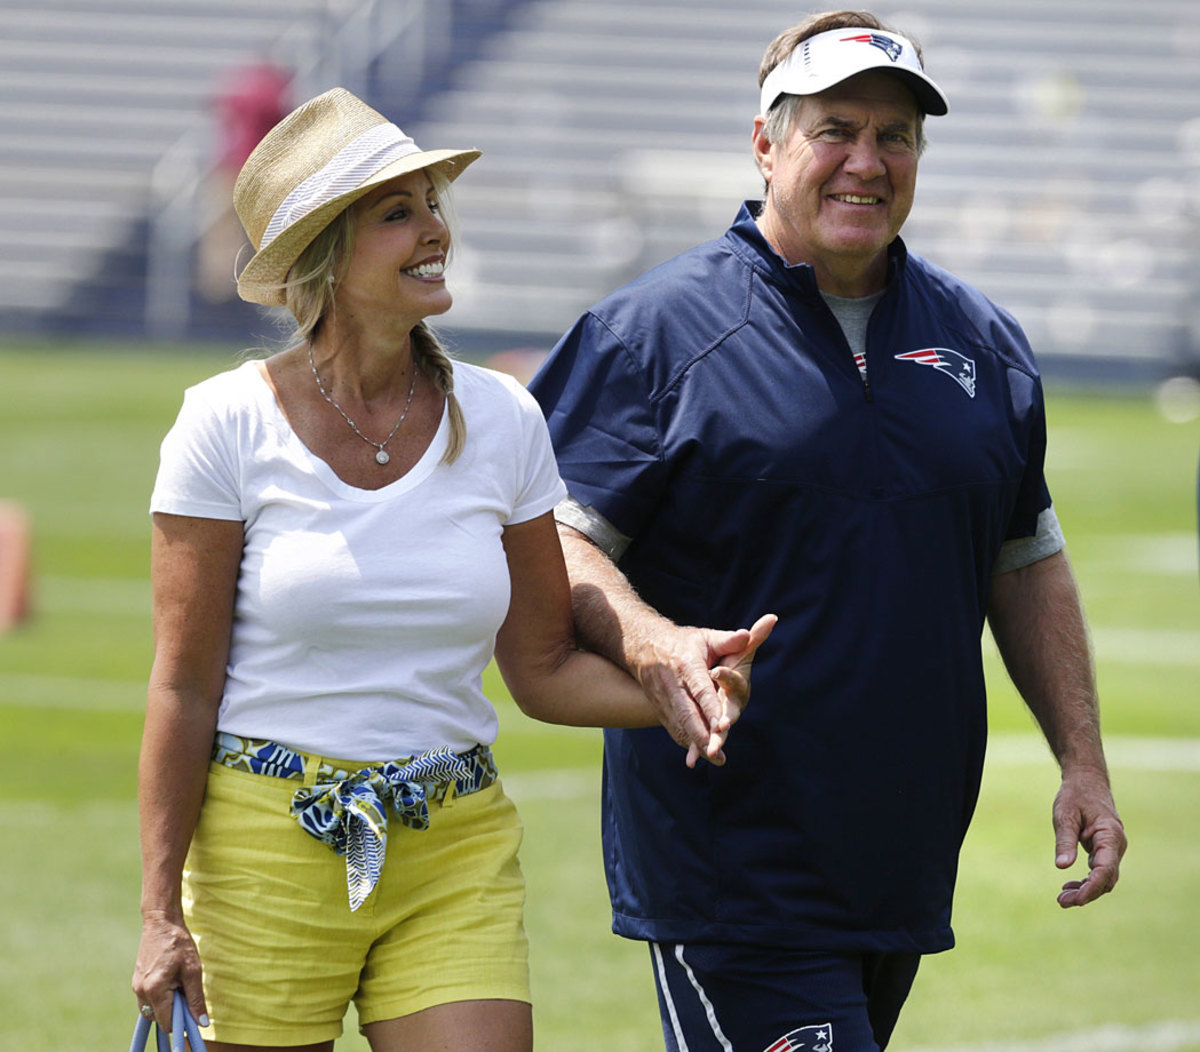 New-England-Patriots-Bill-Belichick-girlfriend-Linda-Holliday.jpg